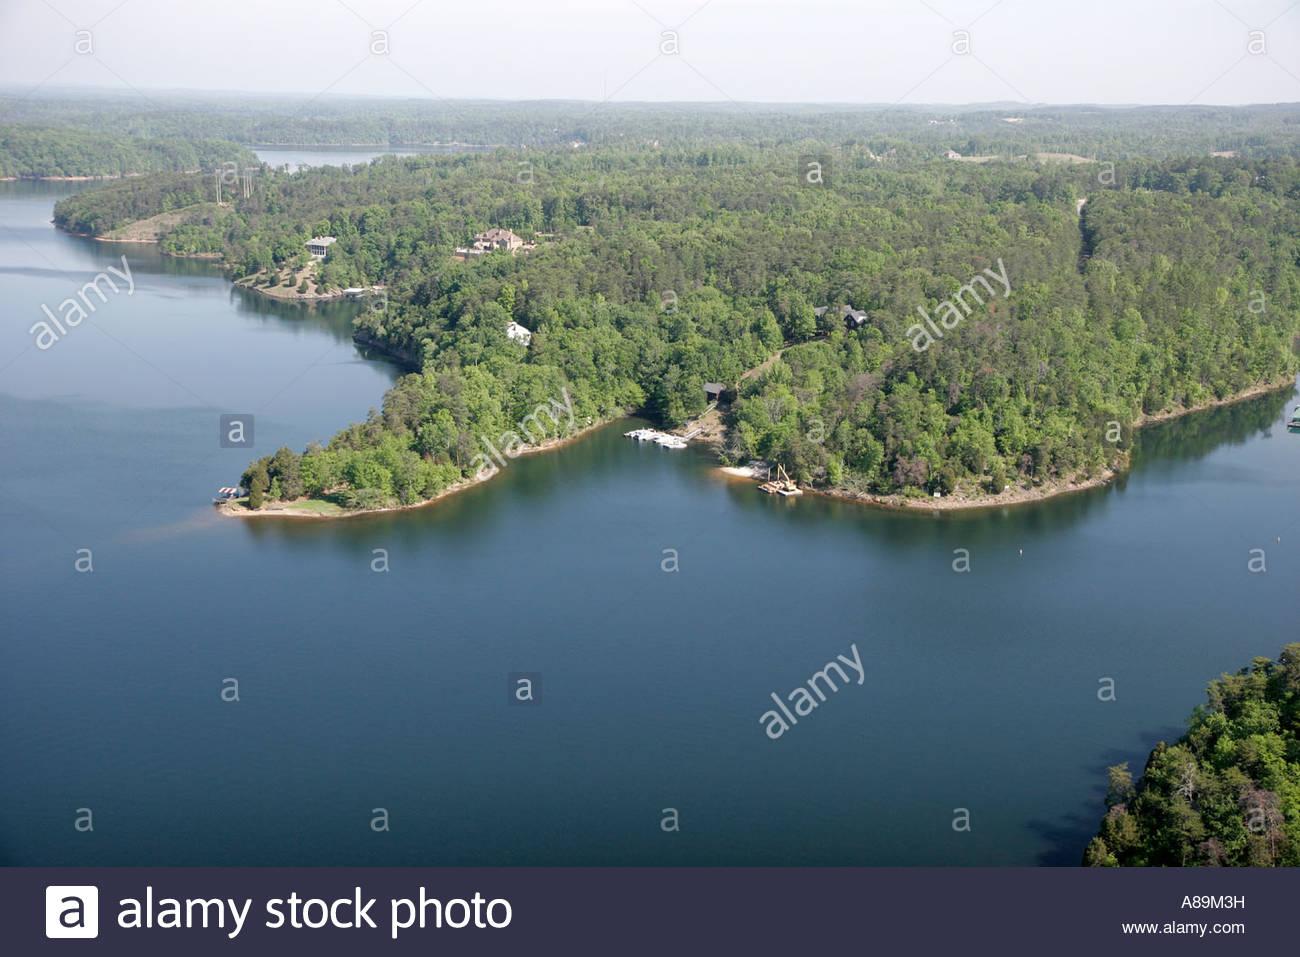 Tuscaloosa Alabama Lake Tuscaloosa aerial - Stock Image